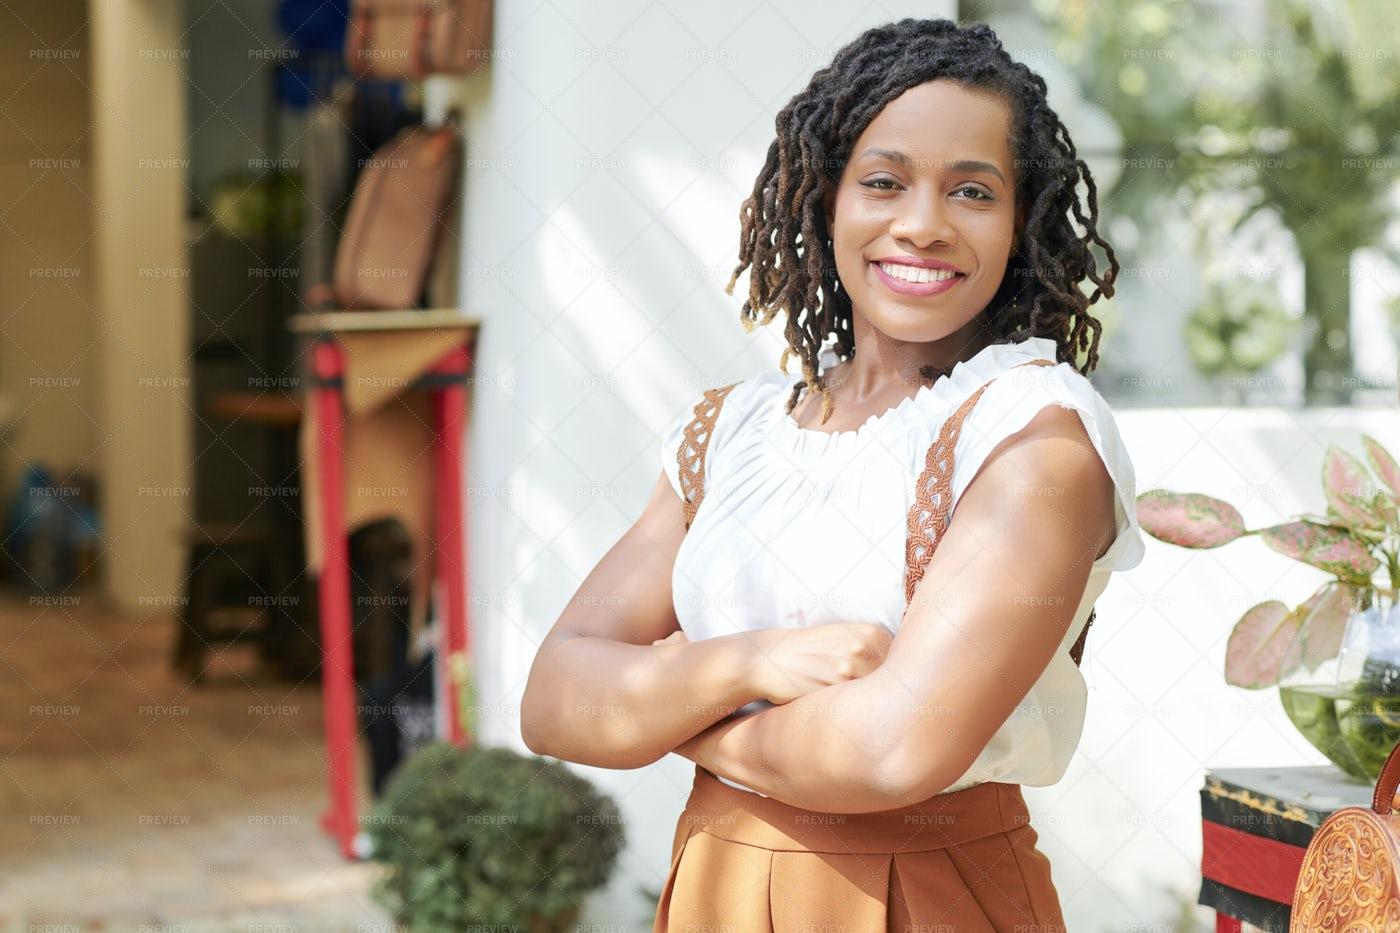 African Woman Standing Outdoors: Stock Photos